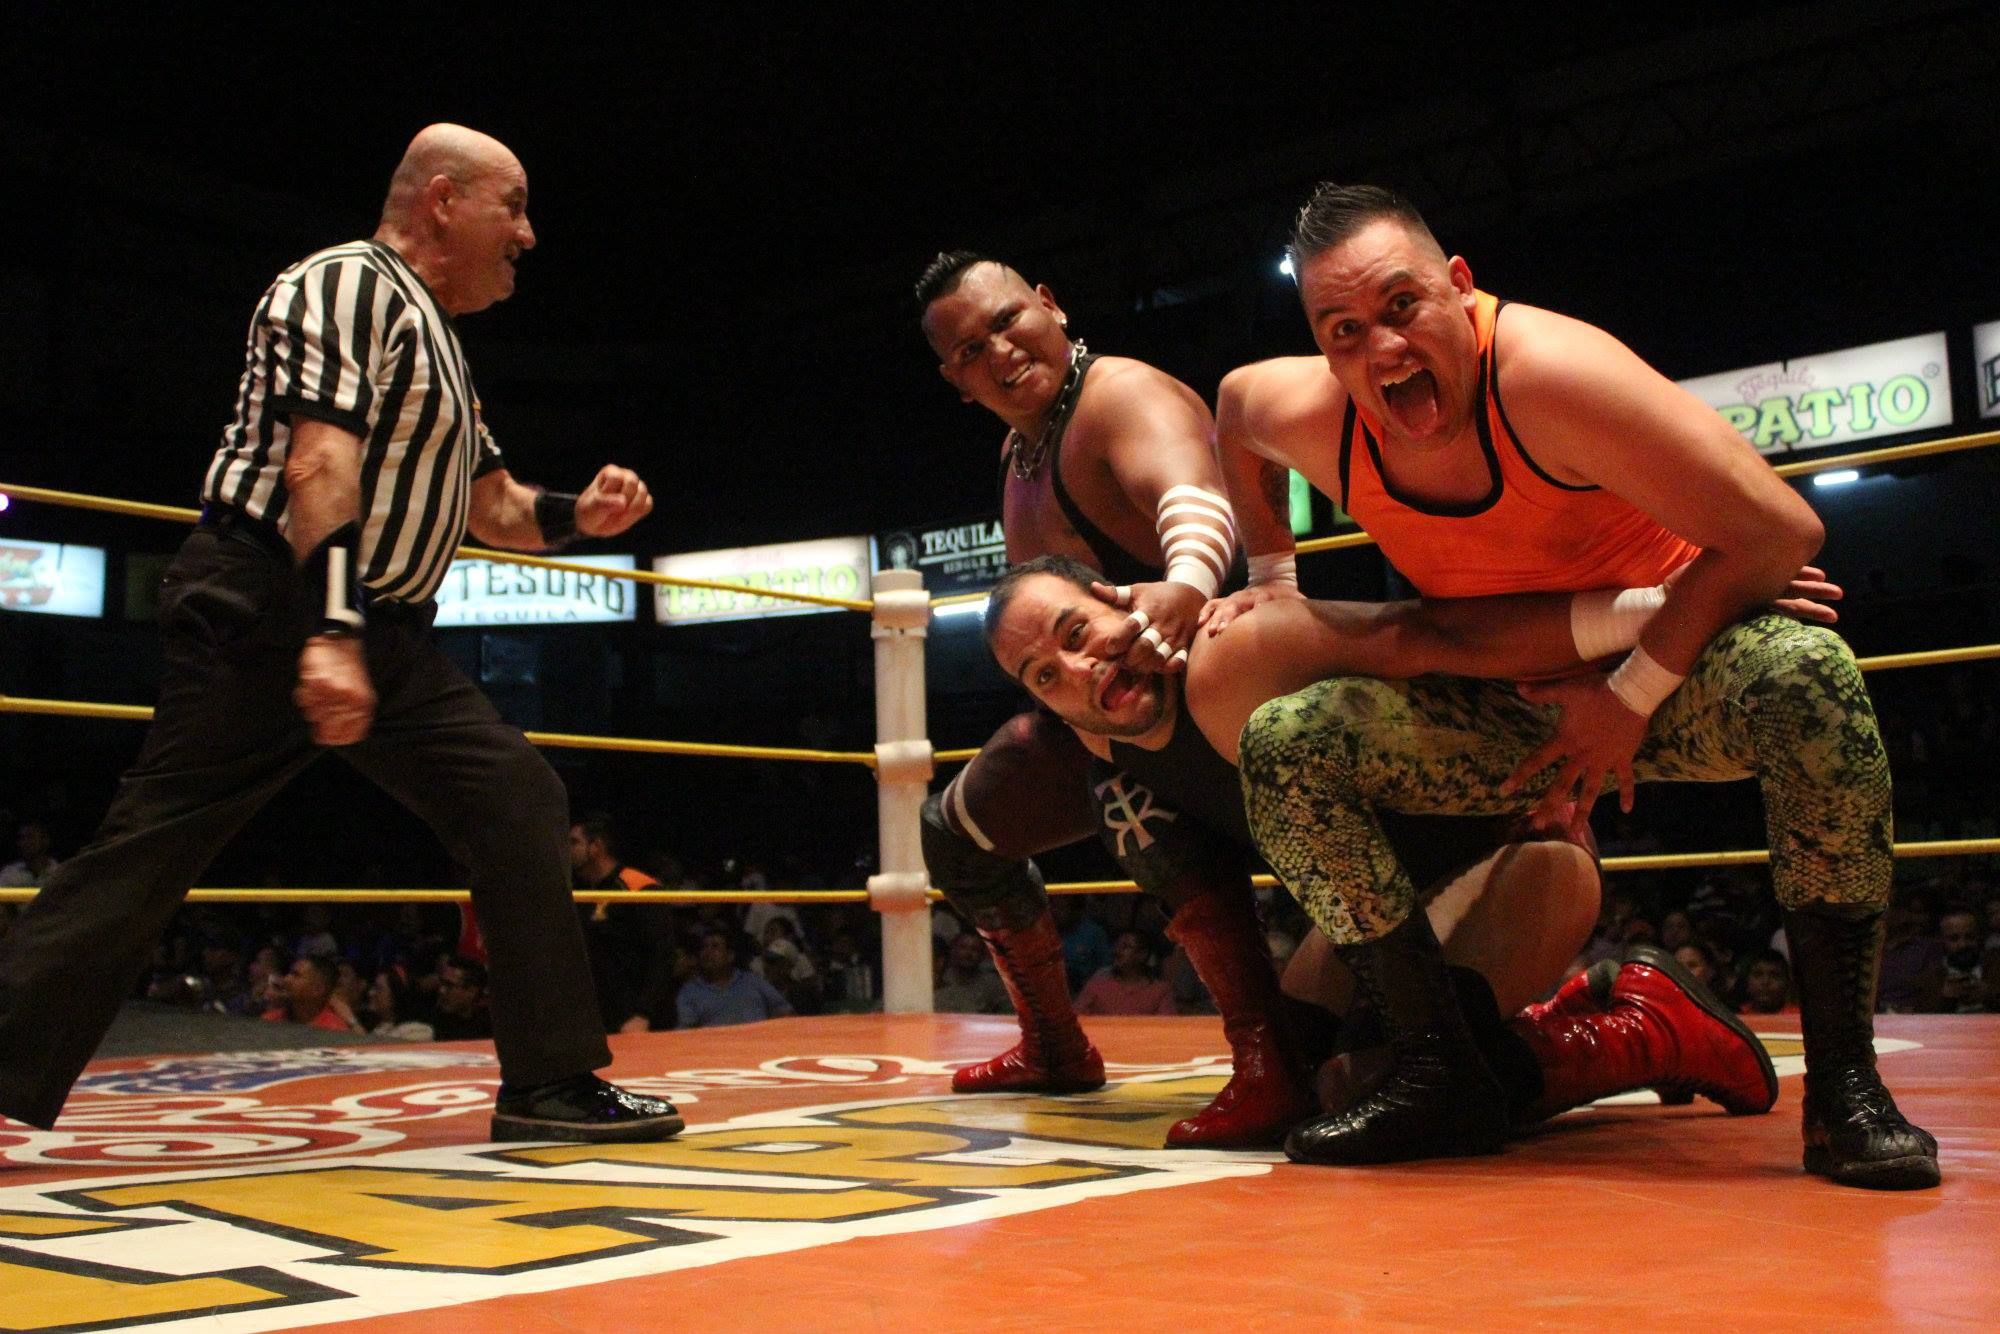 CMLL: Una mirada semanal al CMLL (Del 14 al 20 de marzo de 2019) 14